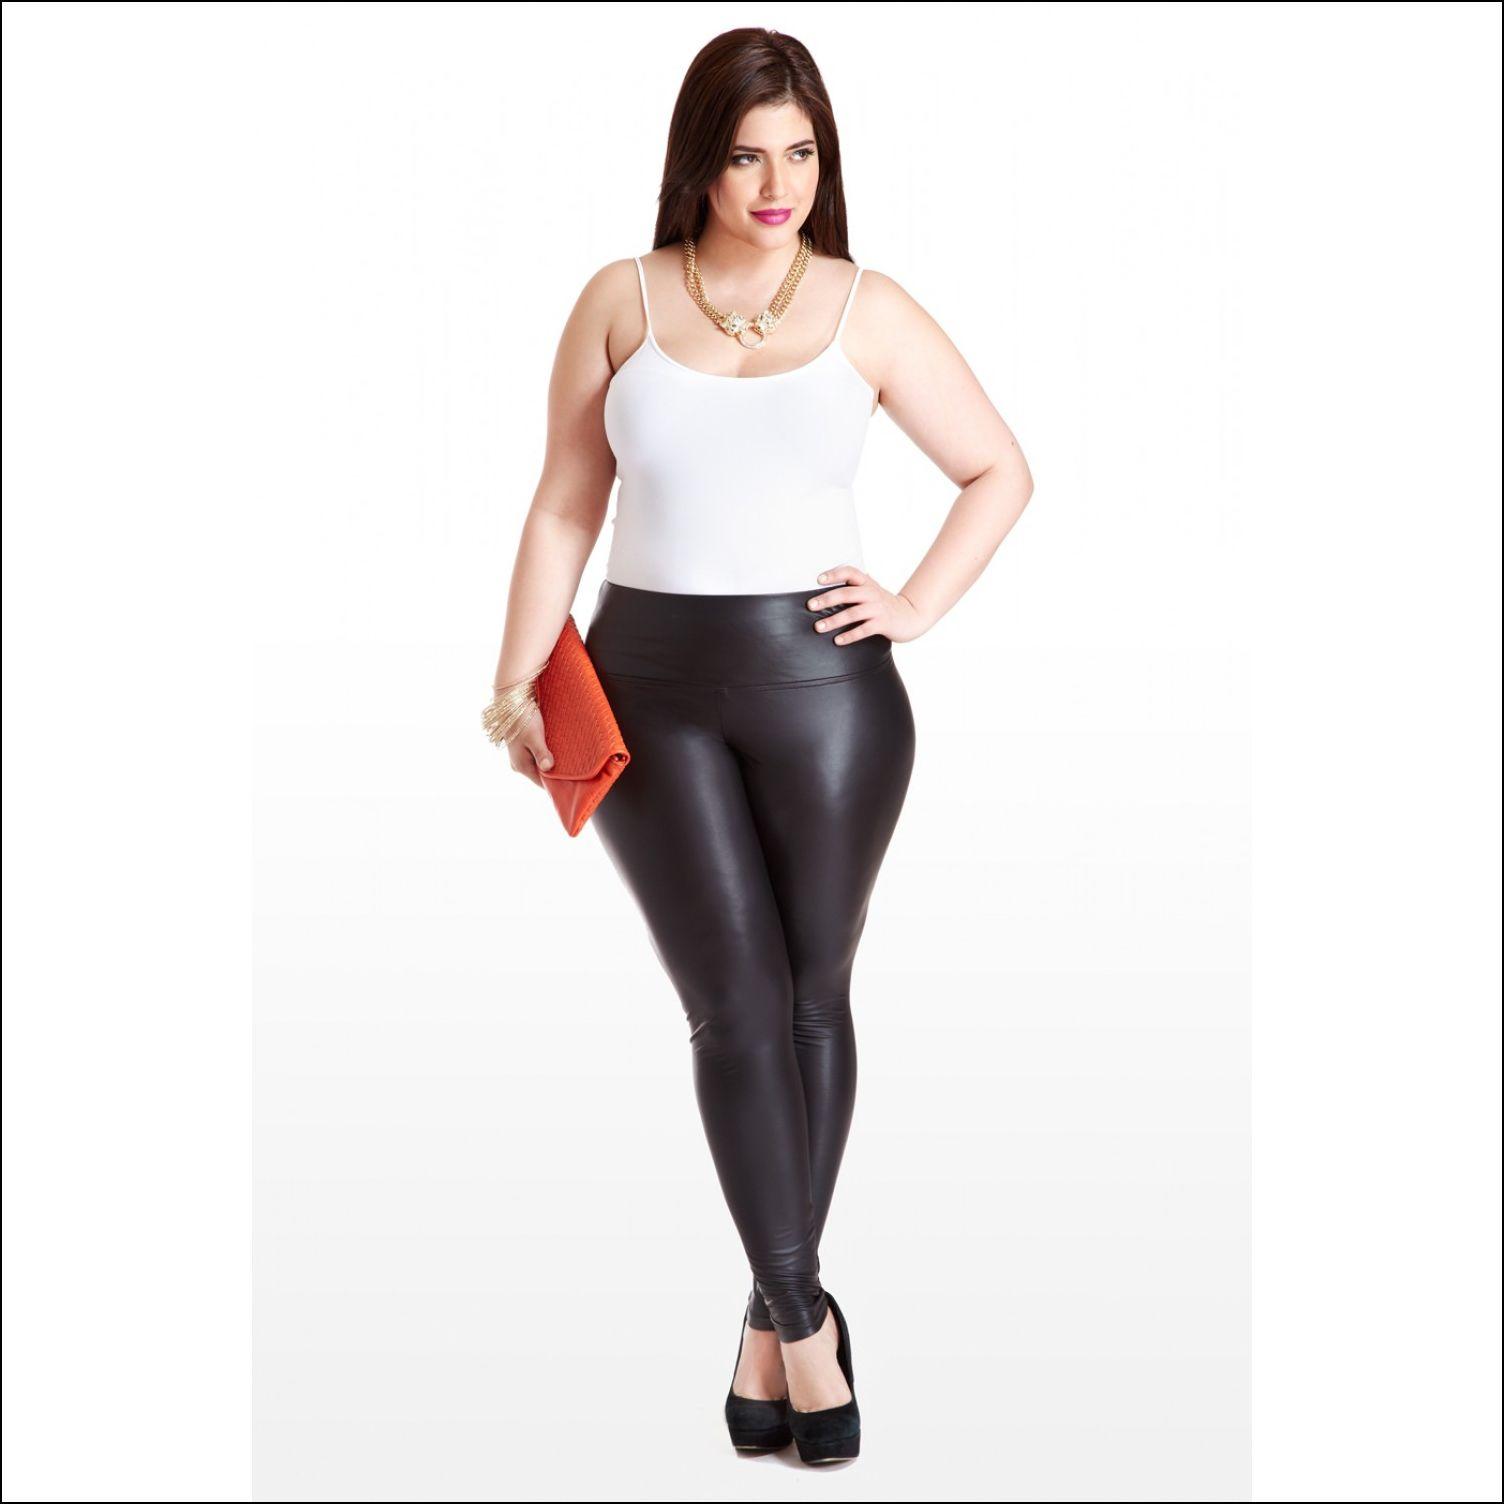 Consejos para usar leggings